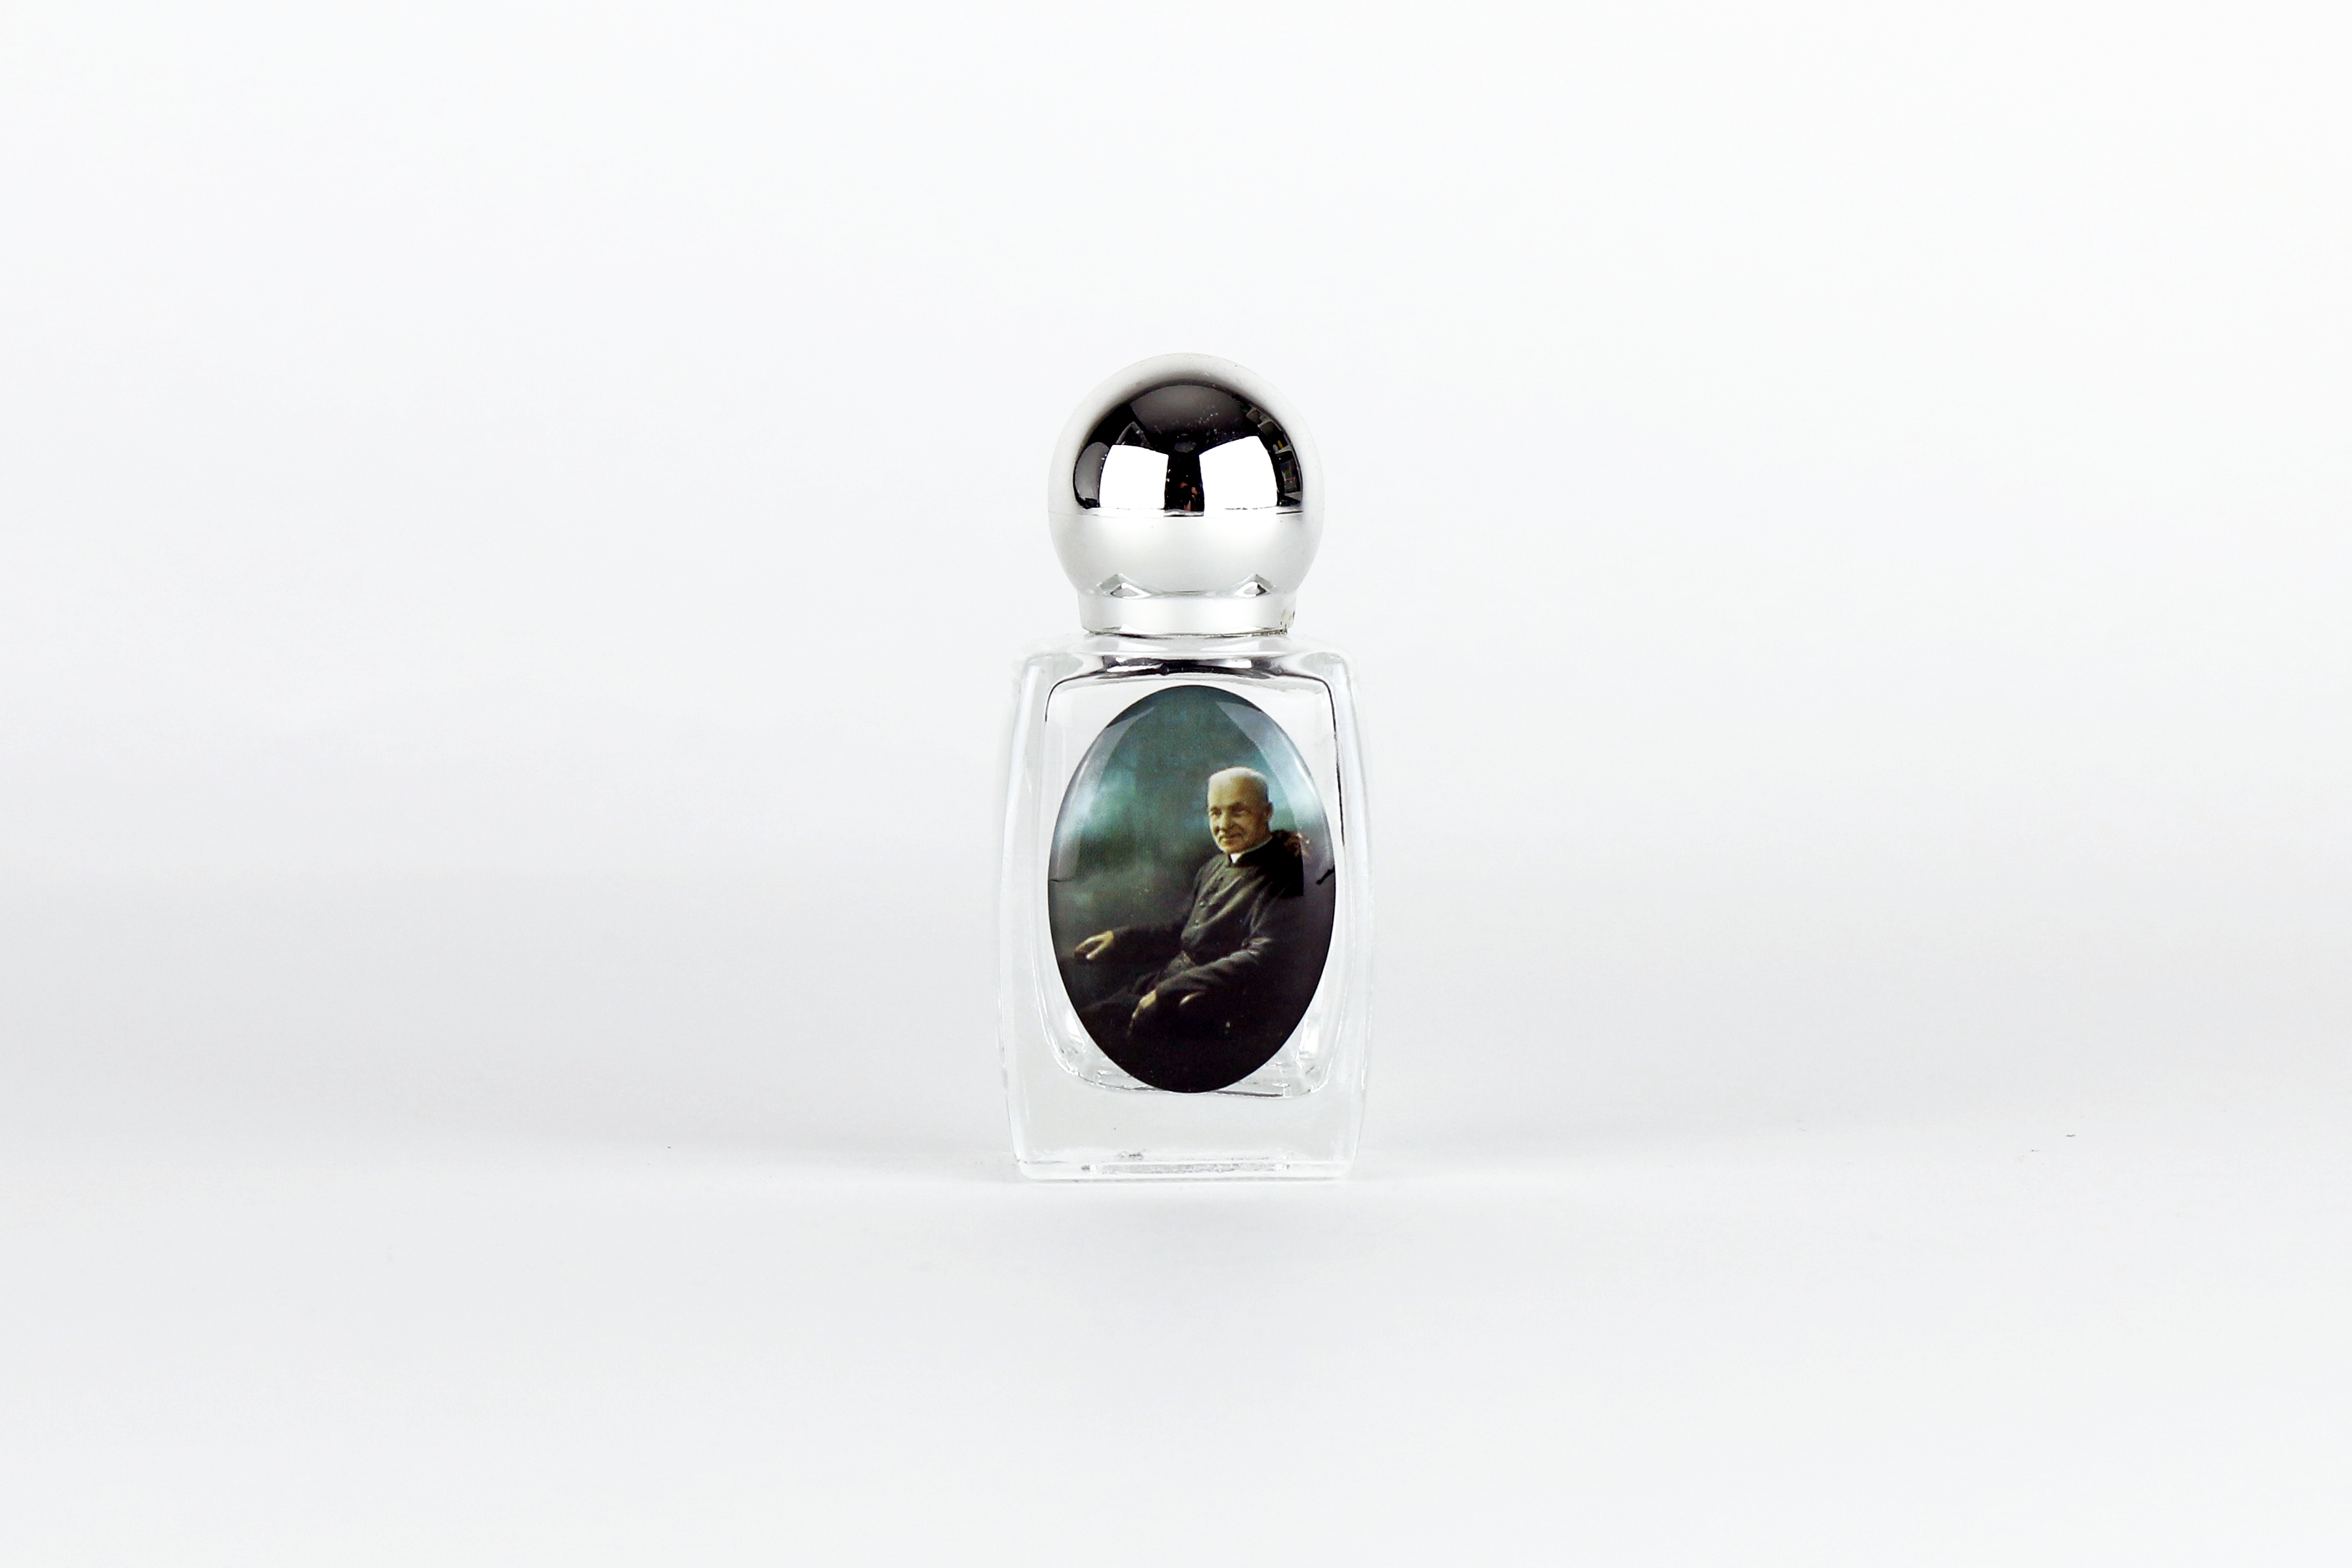 bouteille pour eau bénite / Bottle for Holy Water